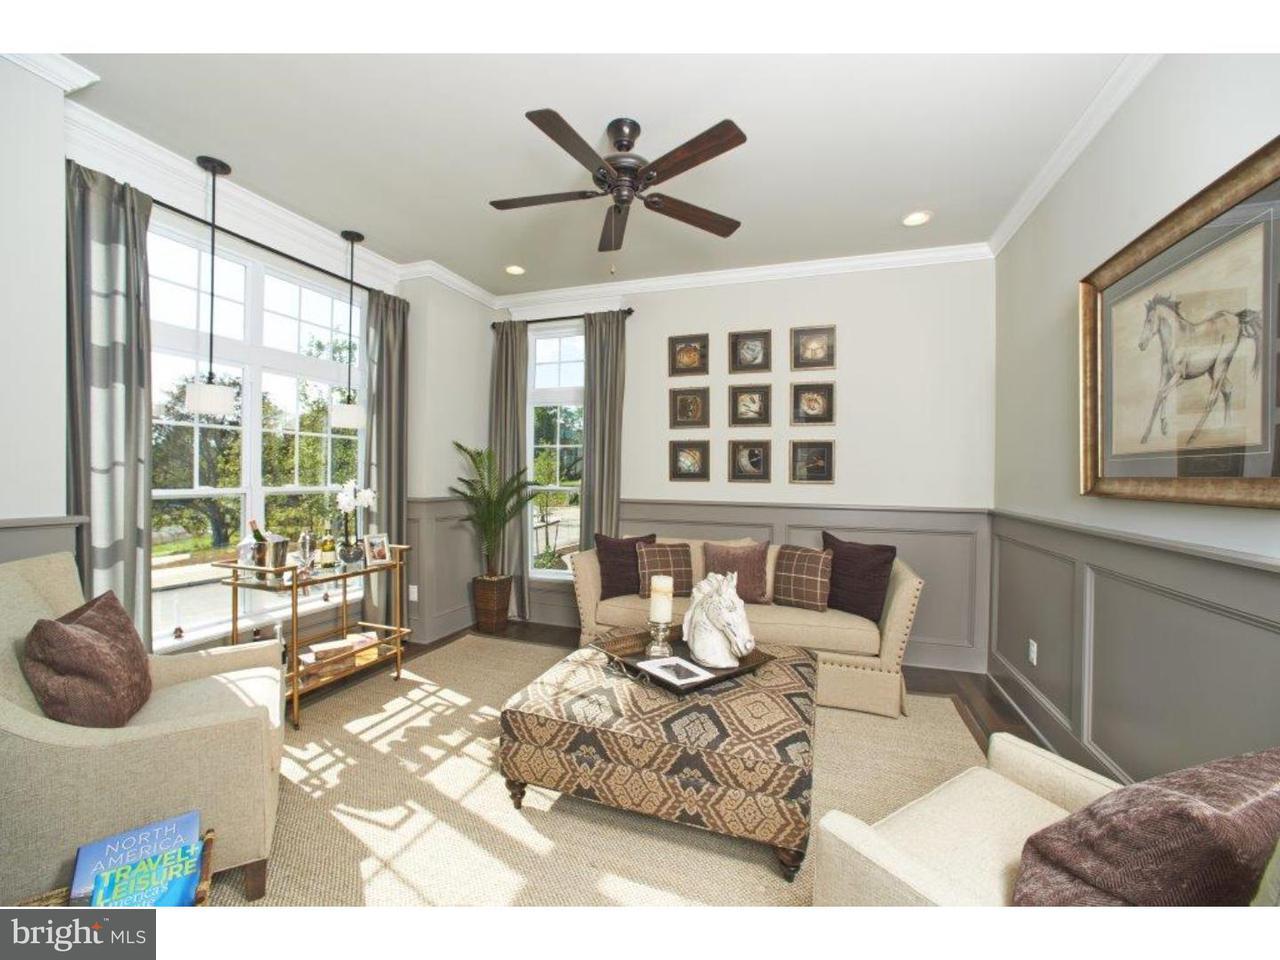 Additional photo for property listing at 133 SPRING OAK DR #00PYT  Malvern, Pennsylvania 19355 Estados Unidos